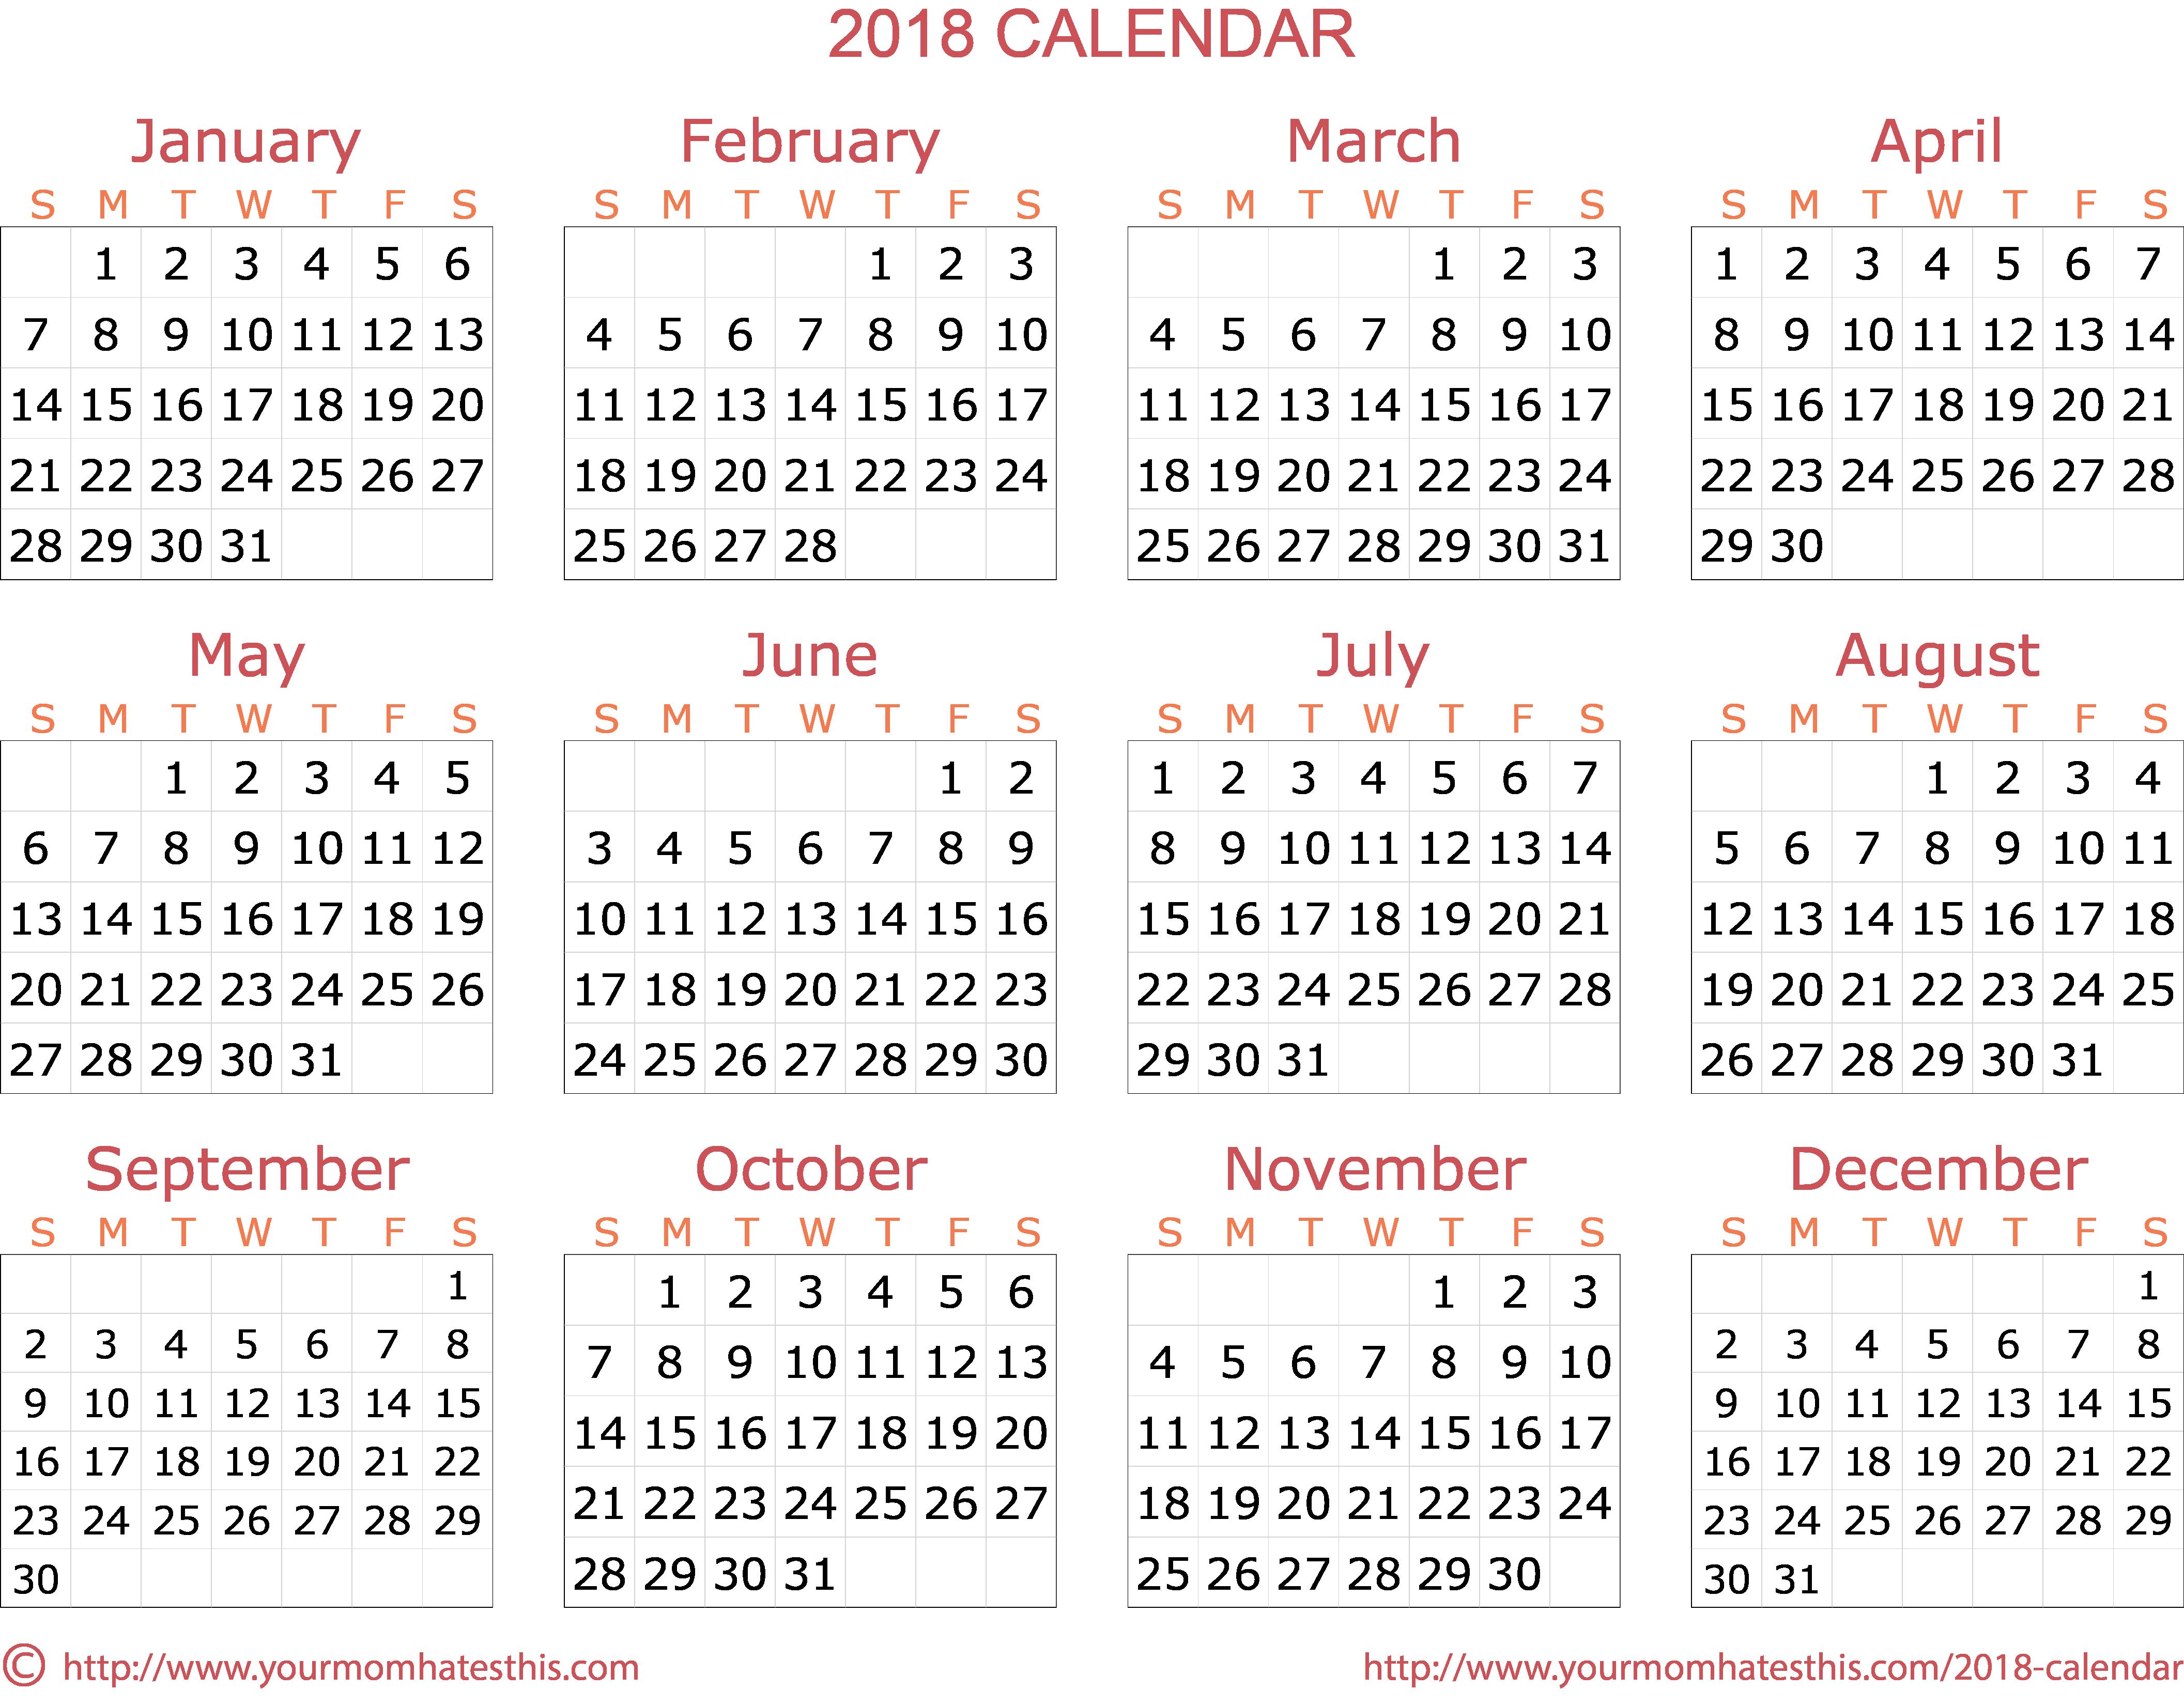 2018 Calendar Png Calendar Calendar Png November Calendar Calendar